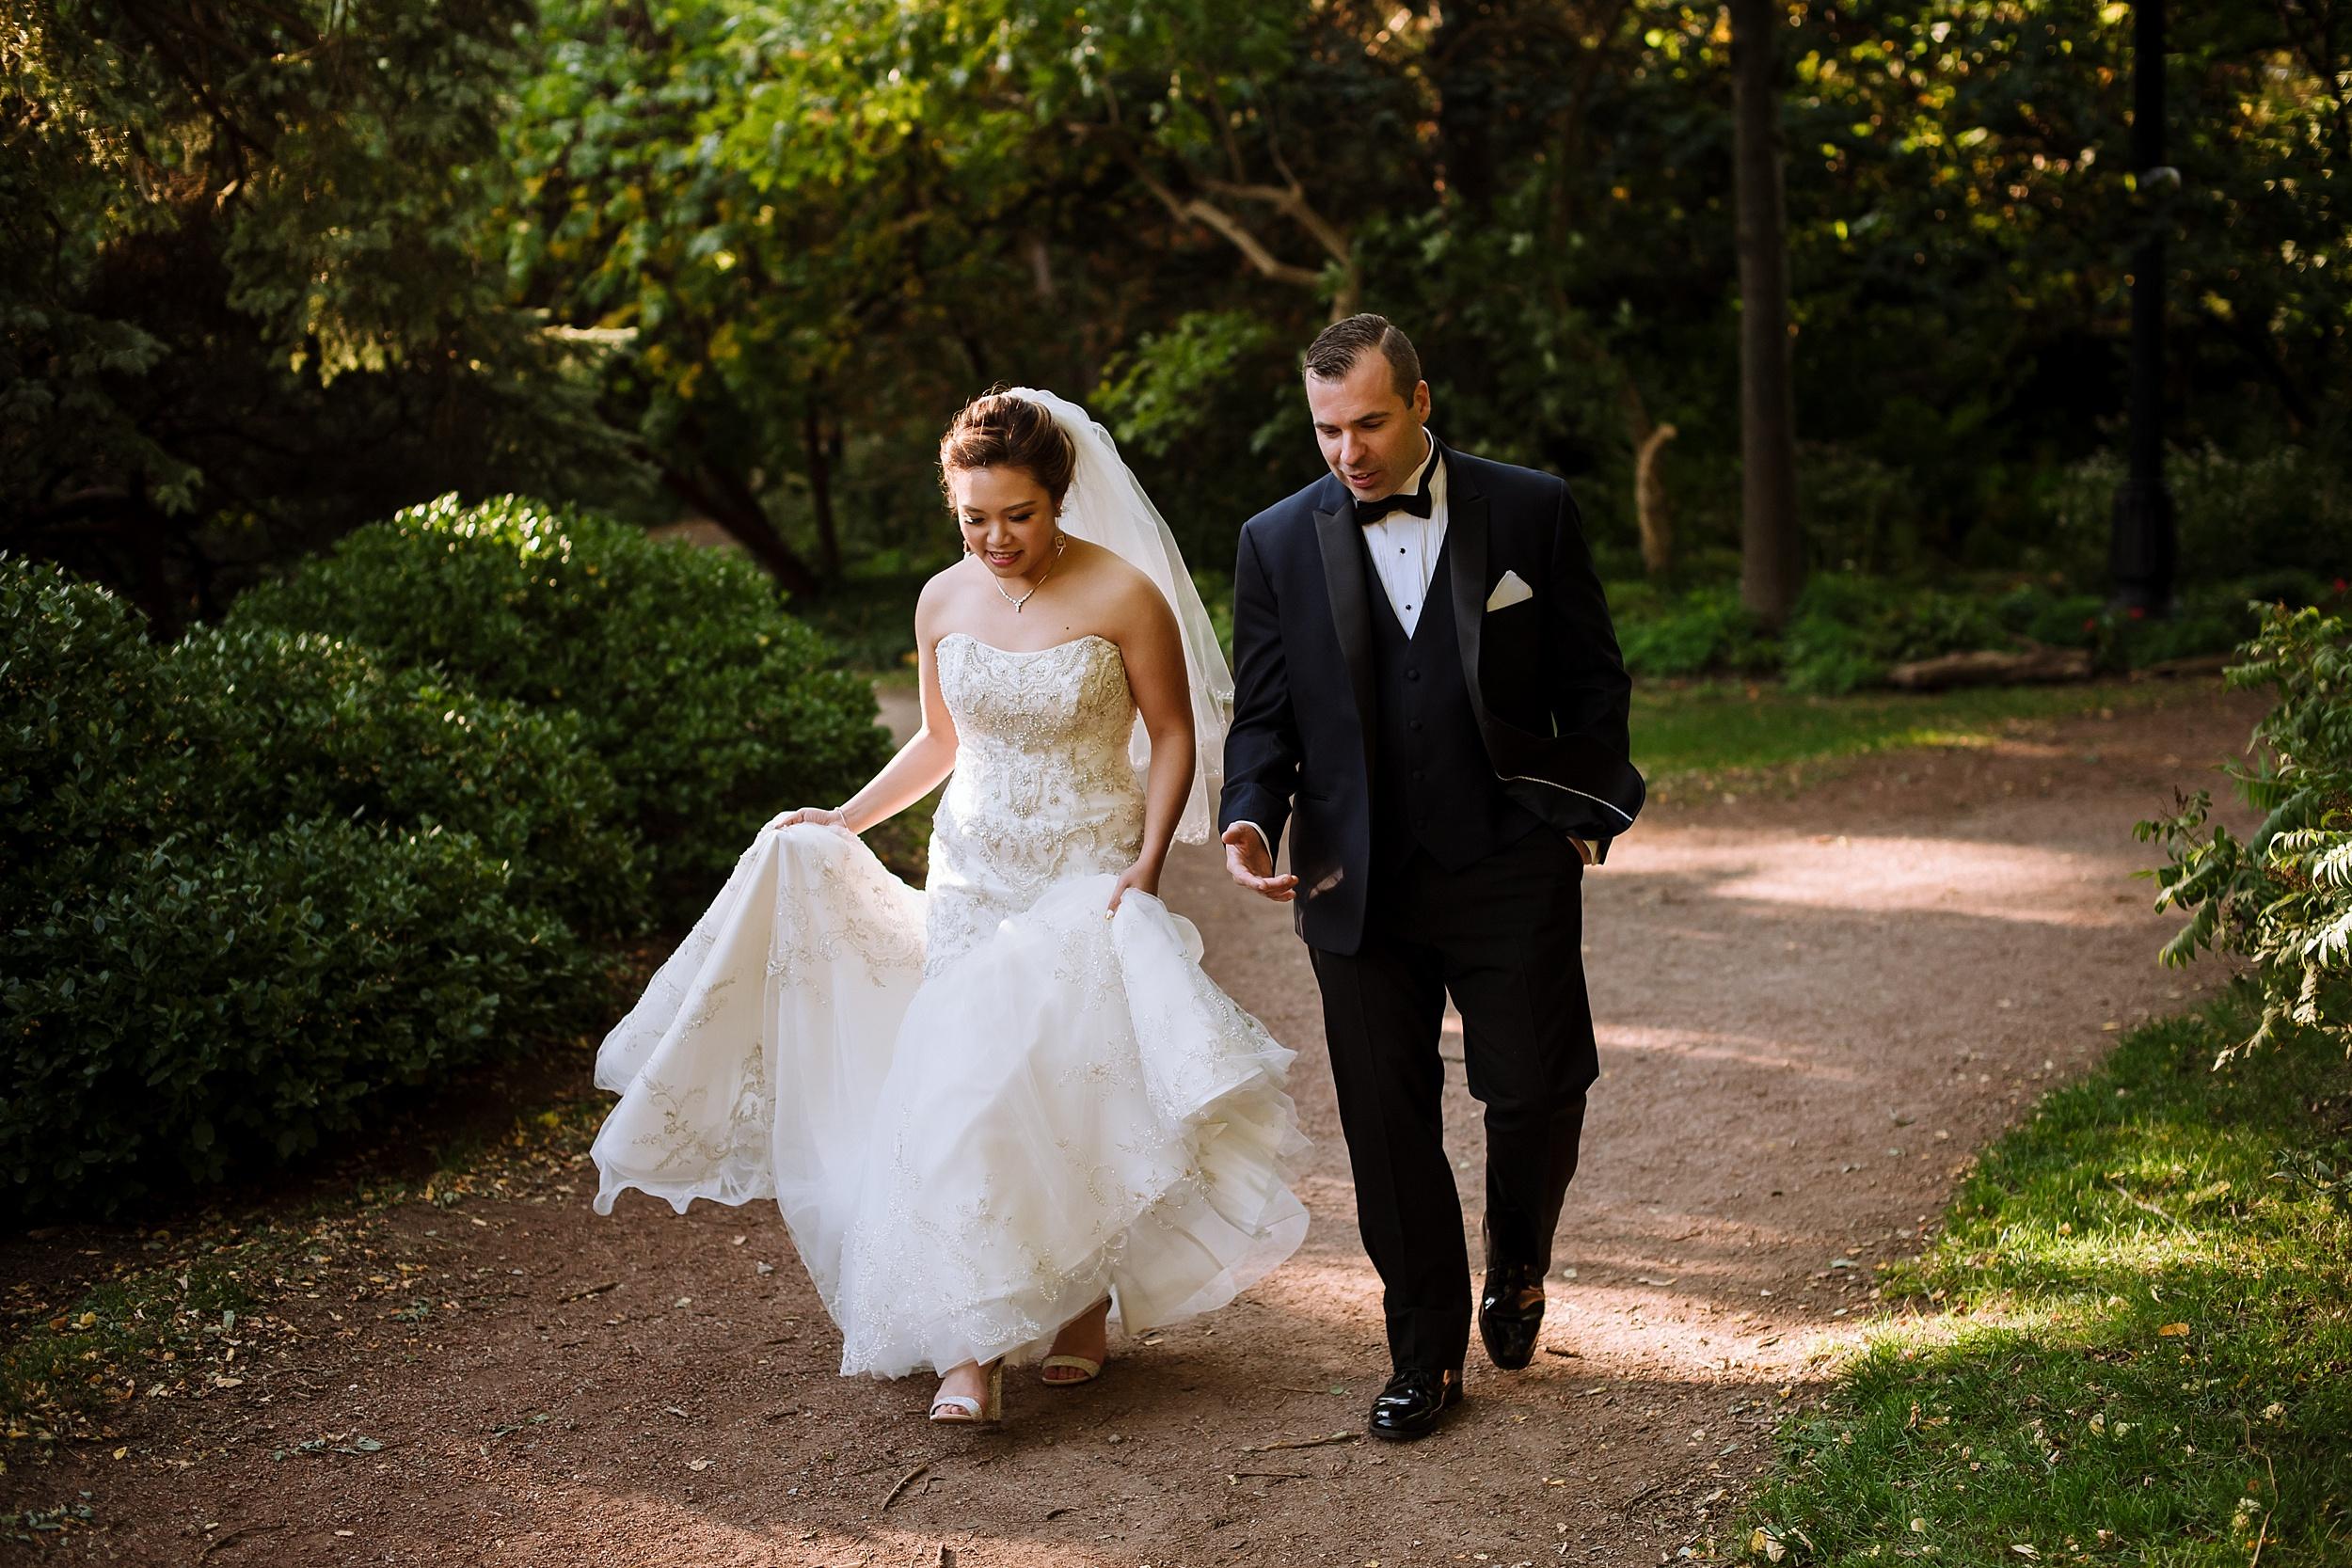 Sunnybrook_Estates_Alexander_Muir_Toronto_Wedding_Photographer_0021.jpg